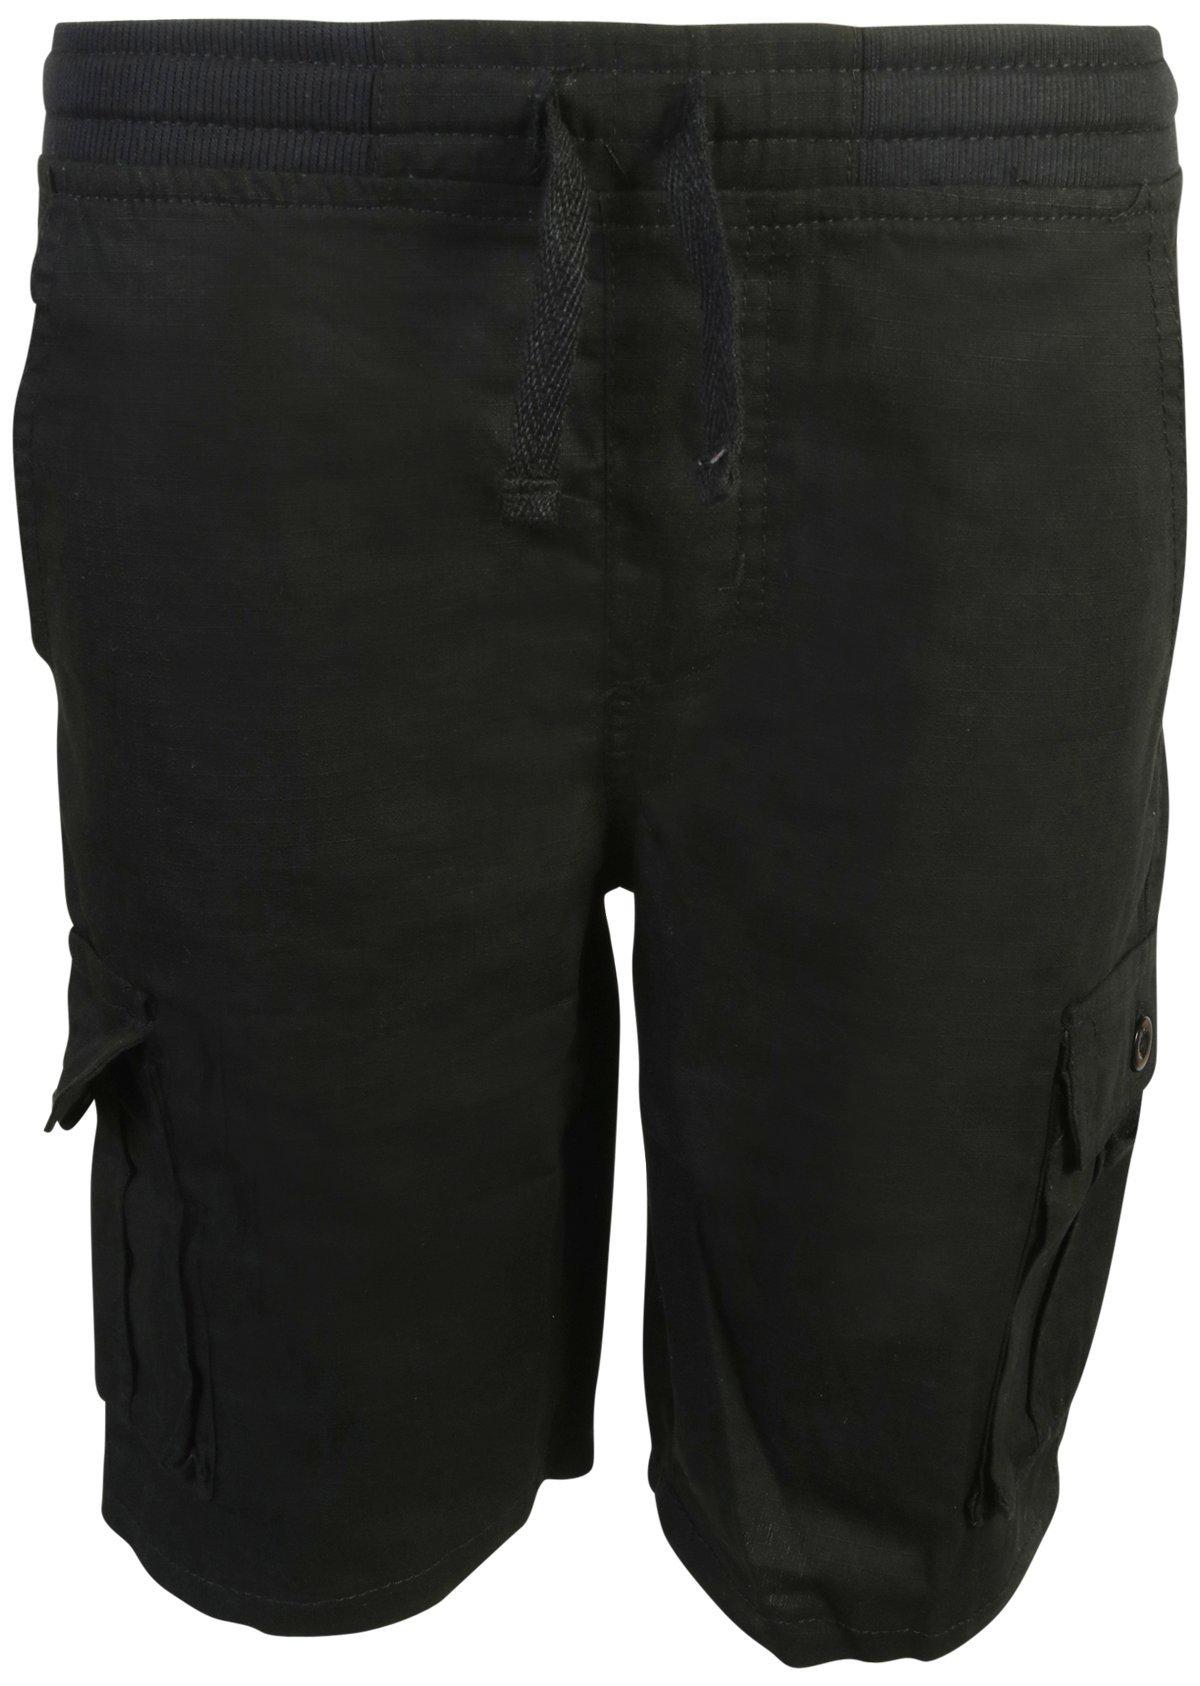 Quad Seven Boys Pull-On Ripstop Cargo Shorts, Black, Size 12'